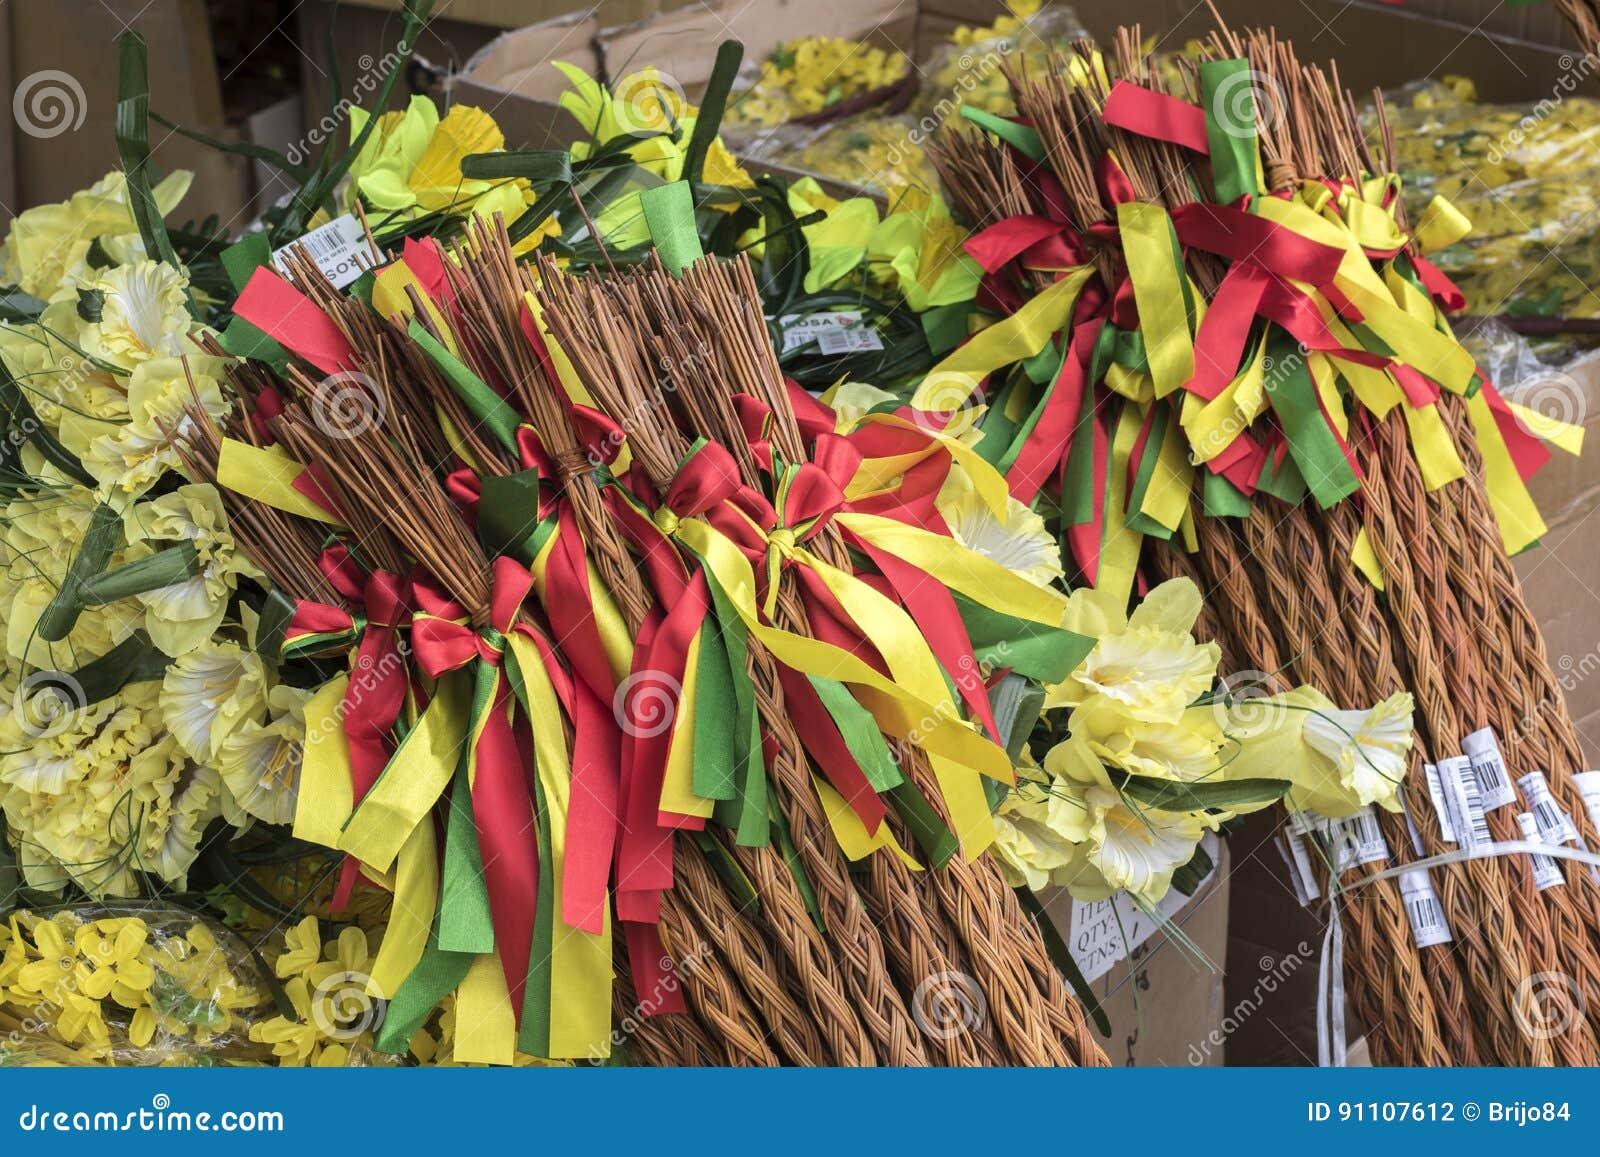 Easter season - flowers and sticks